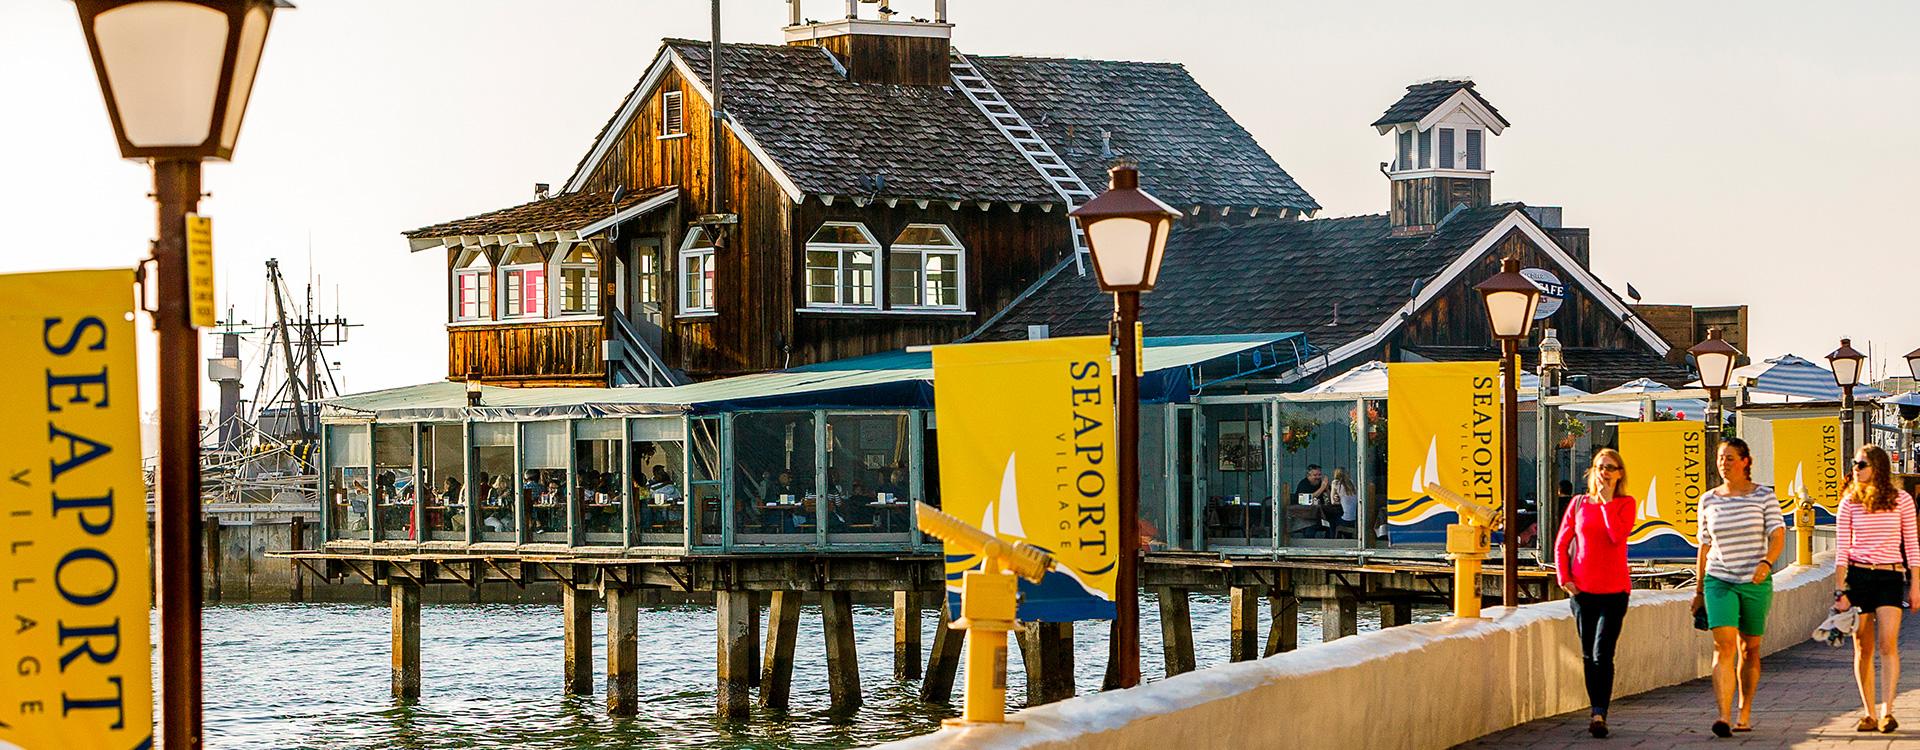 seaport villge